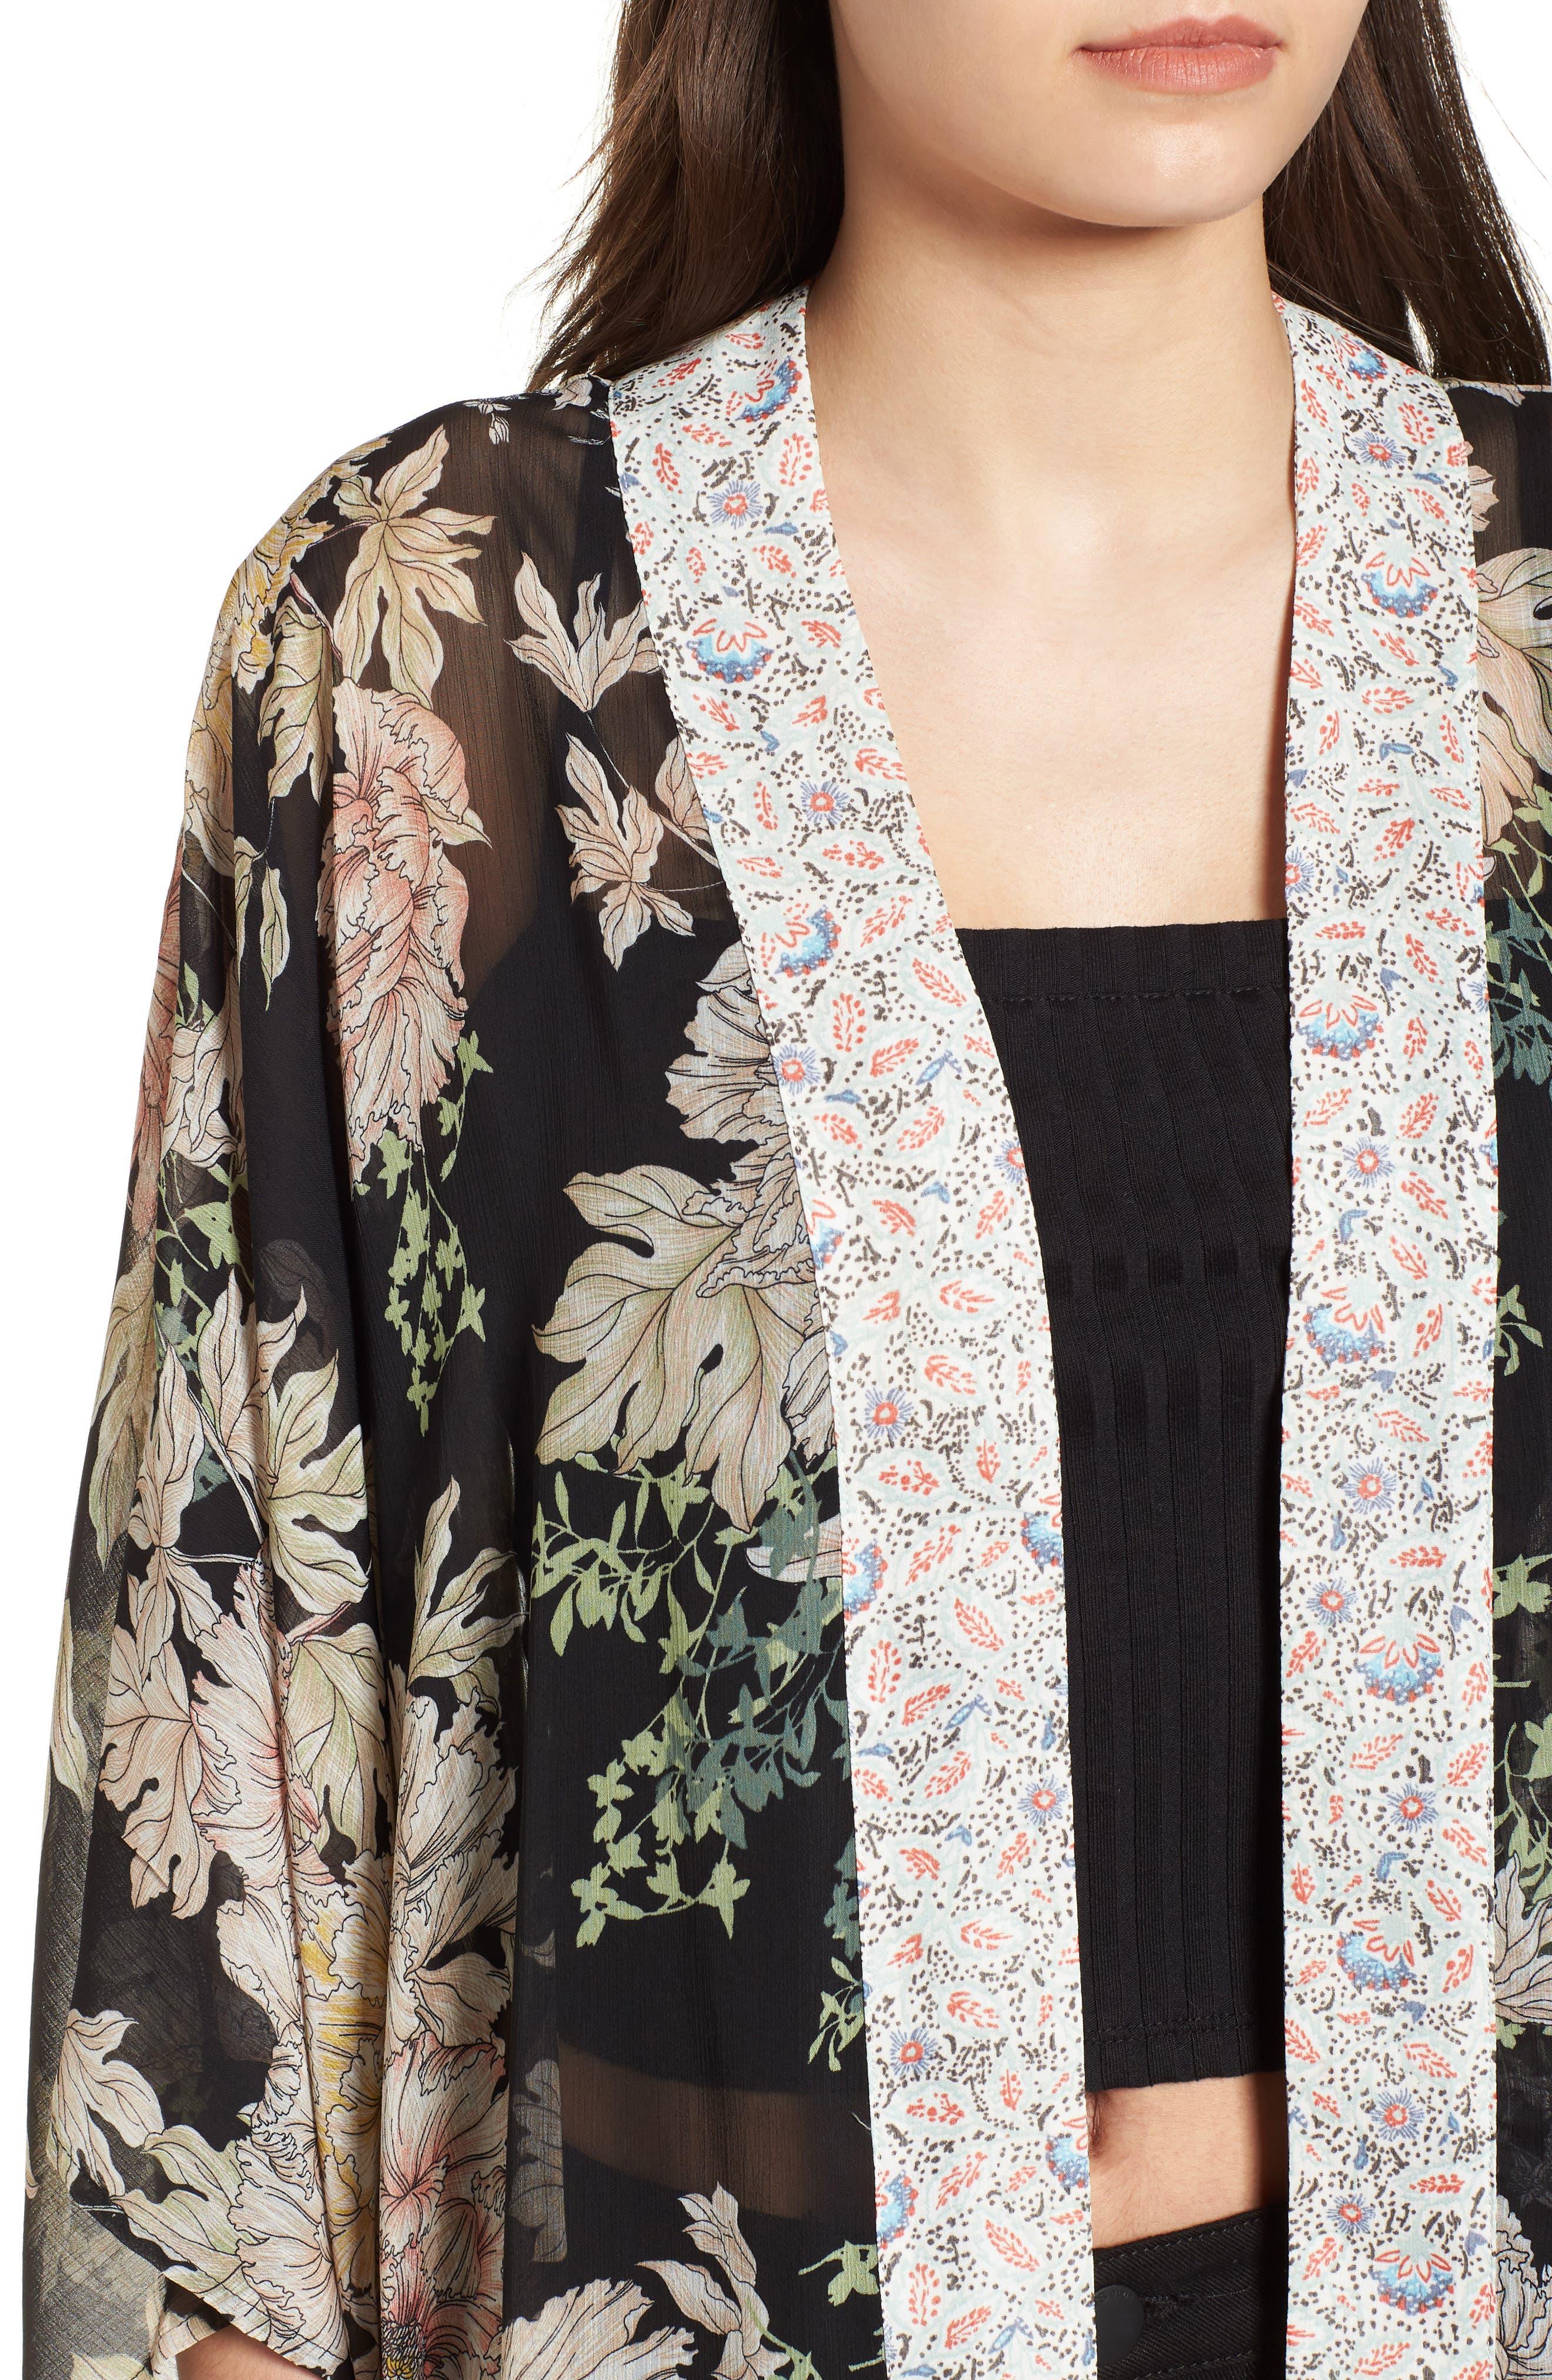 Floral Print Kimono,                             Alternate thumbnail 4, color,                             Black Gold Pink